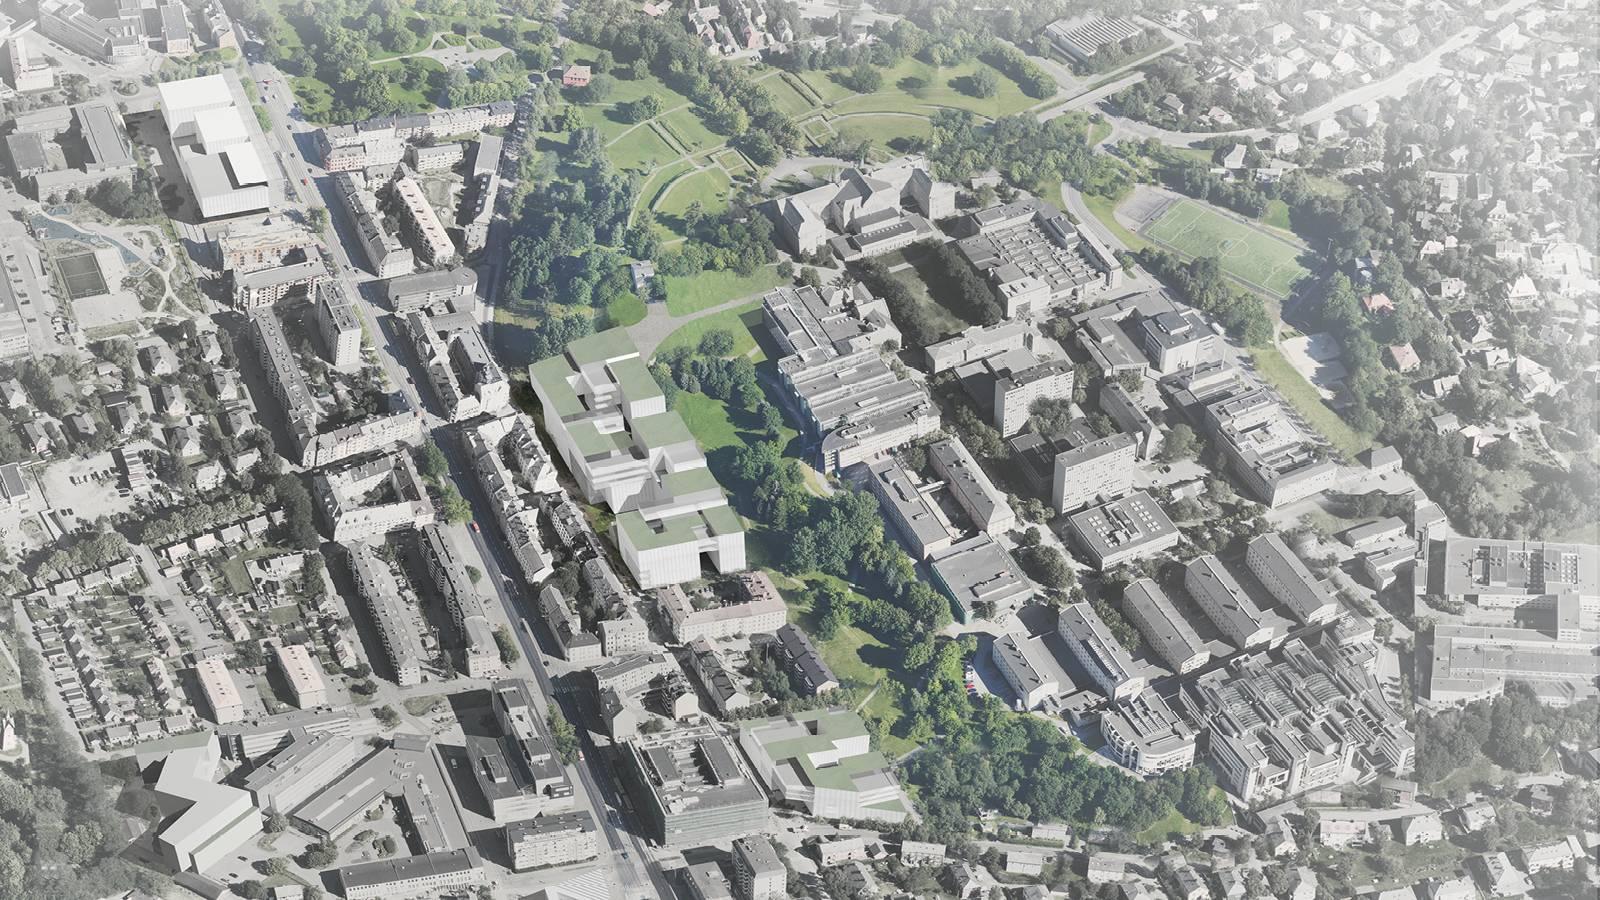 CAMPUS AERIAL VIEW - NTNU – More Park, More City! - SPOL Architects